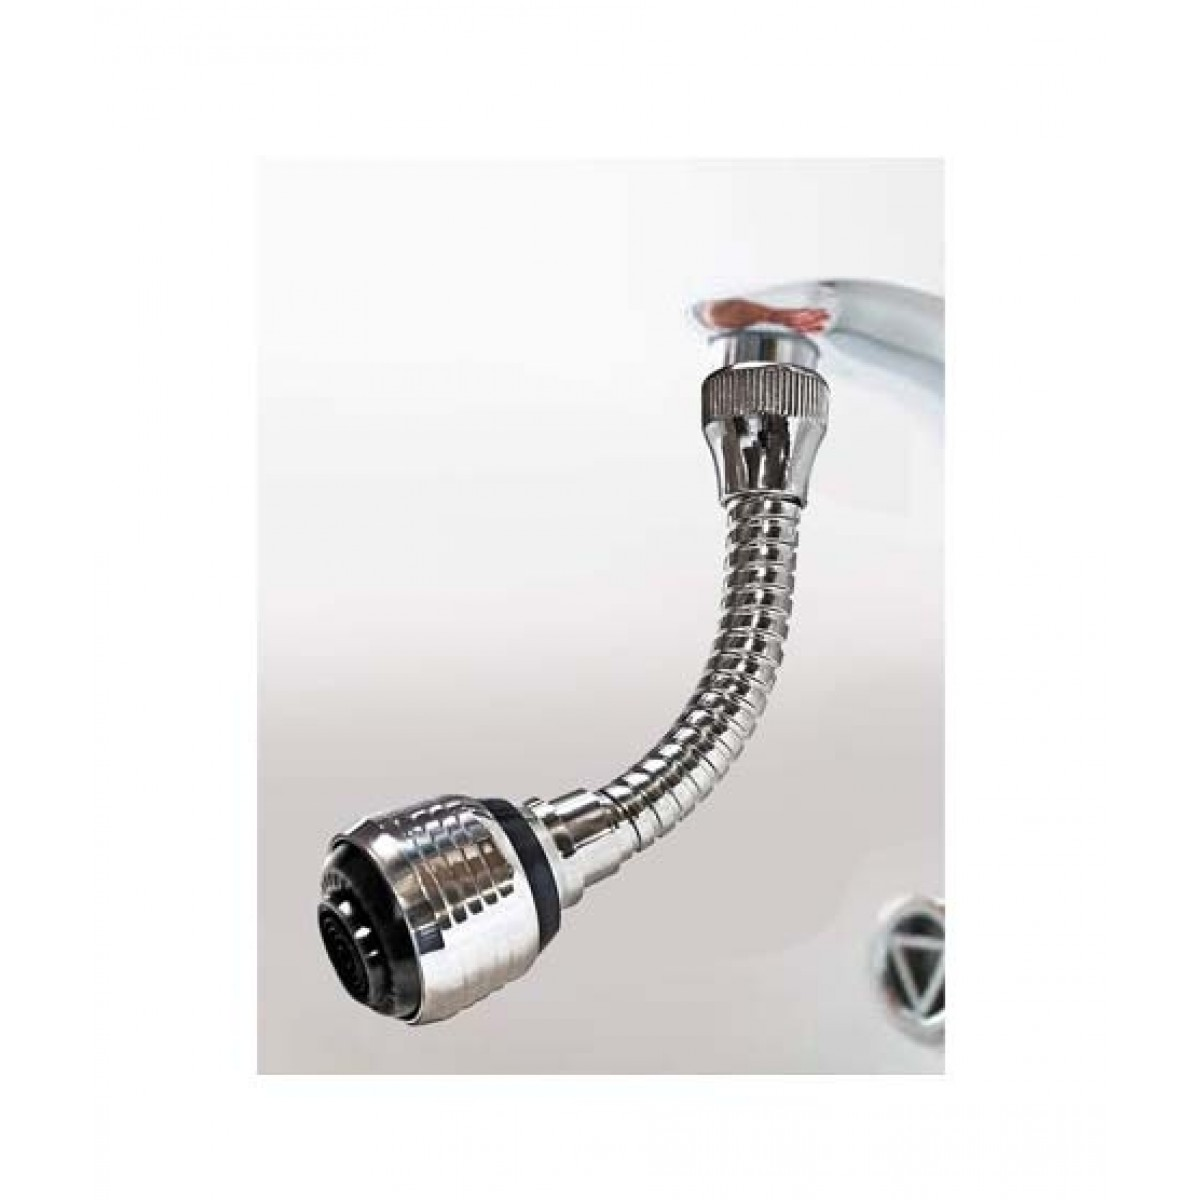 Muzamil Store Turbo Flex 360 Flexible Faucet